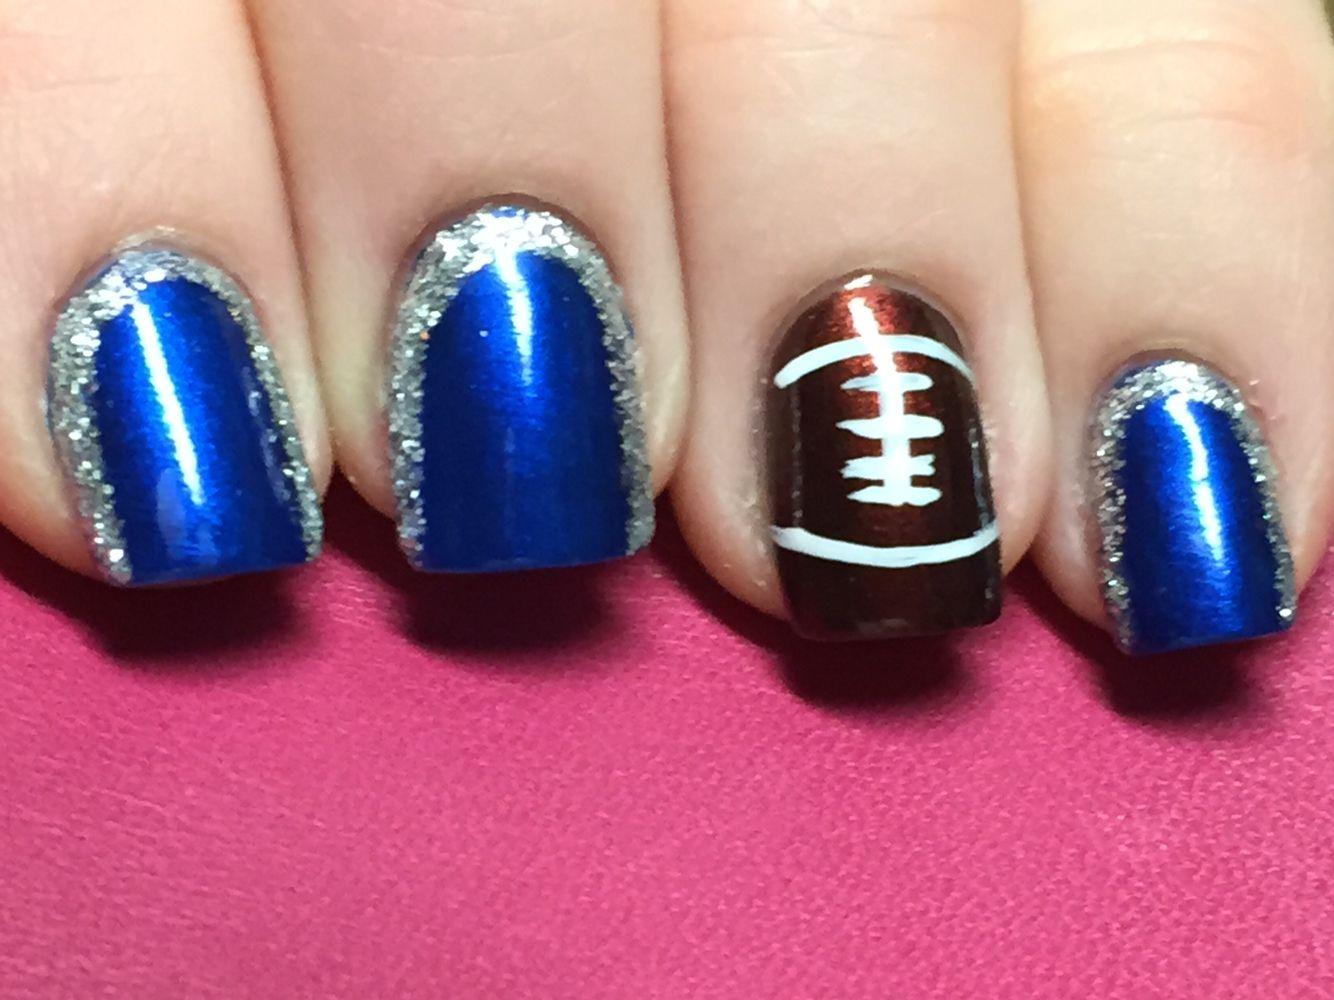 Dallas Cowboys Nails - Electric Blue Essie Polish with Silver ...